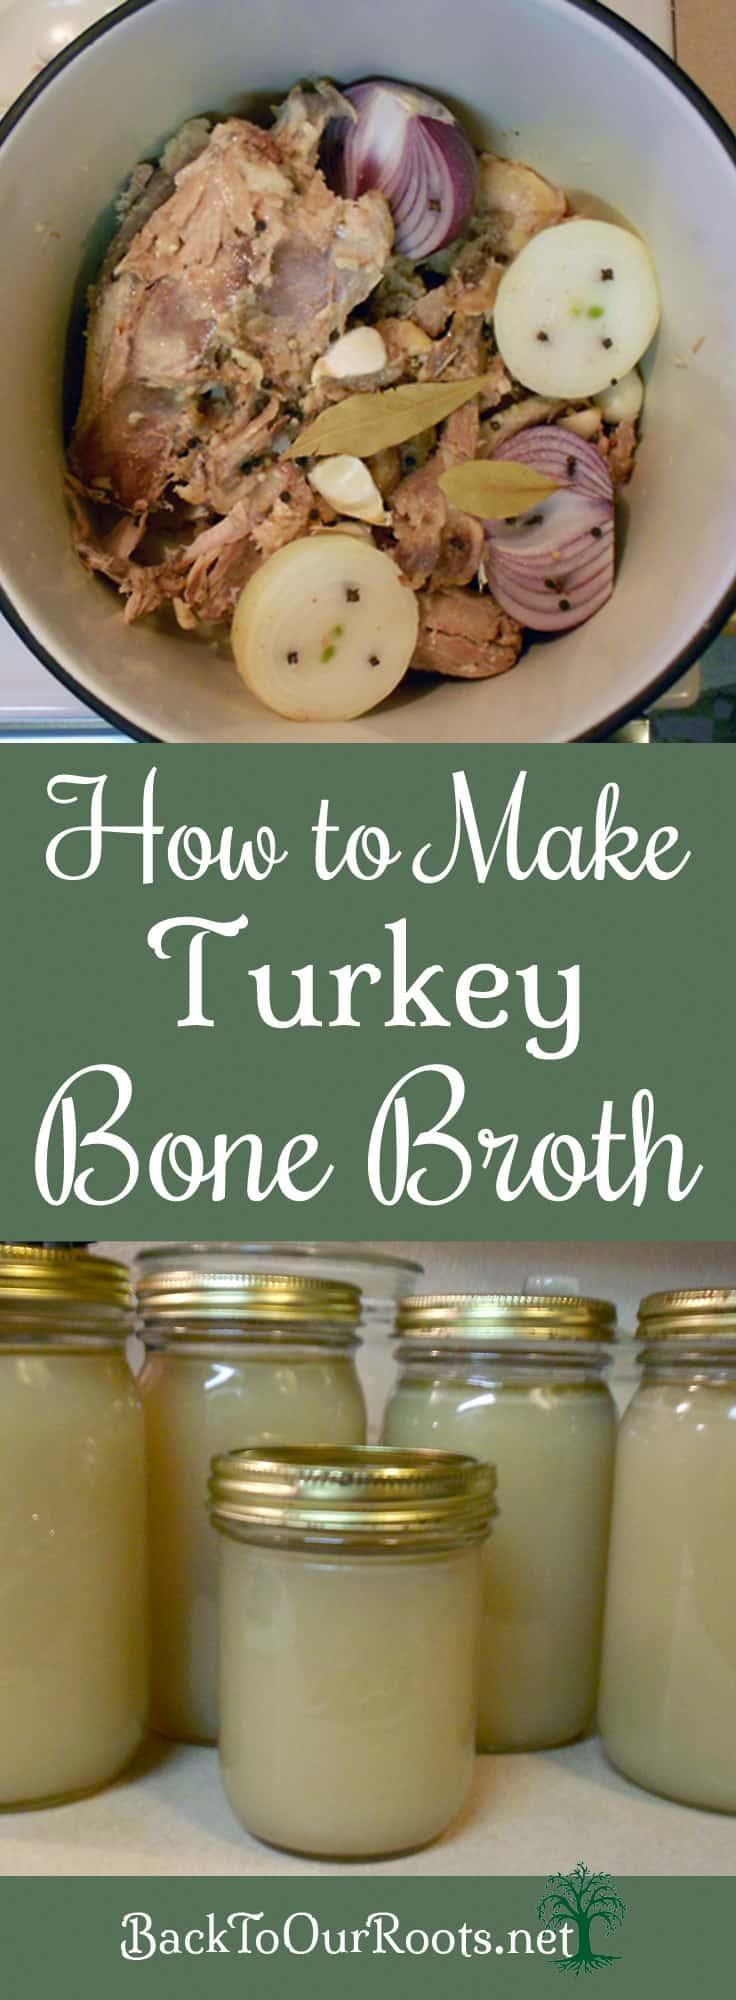 How To Make Turkey Bone Broth